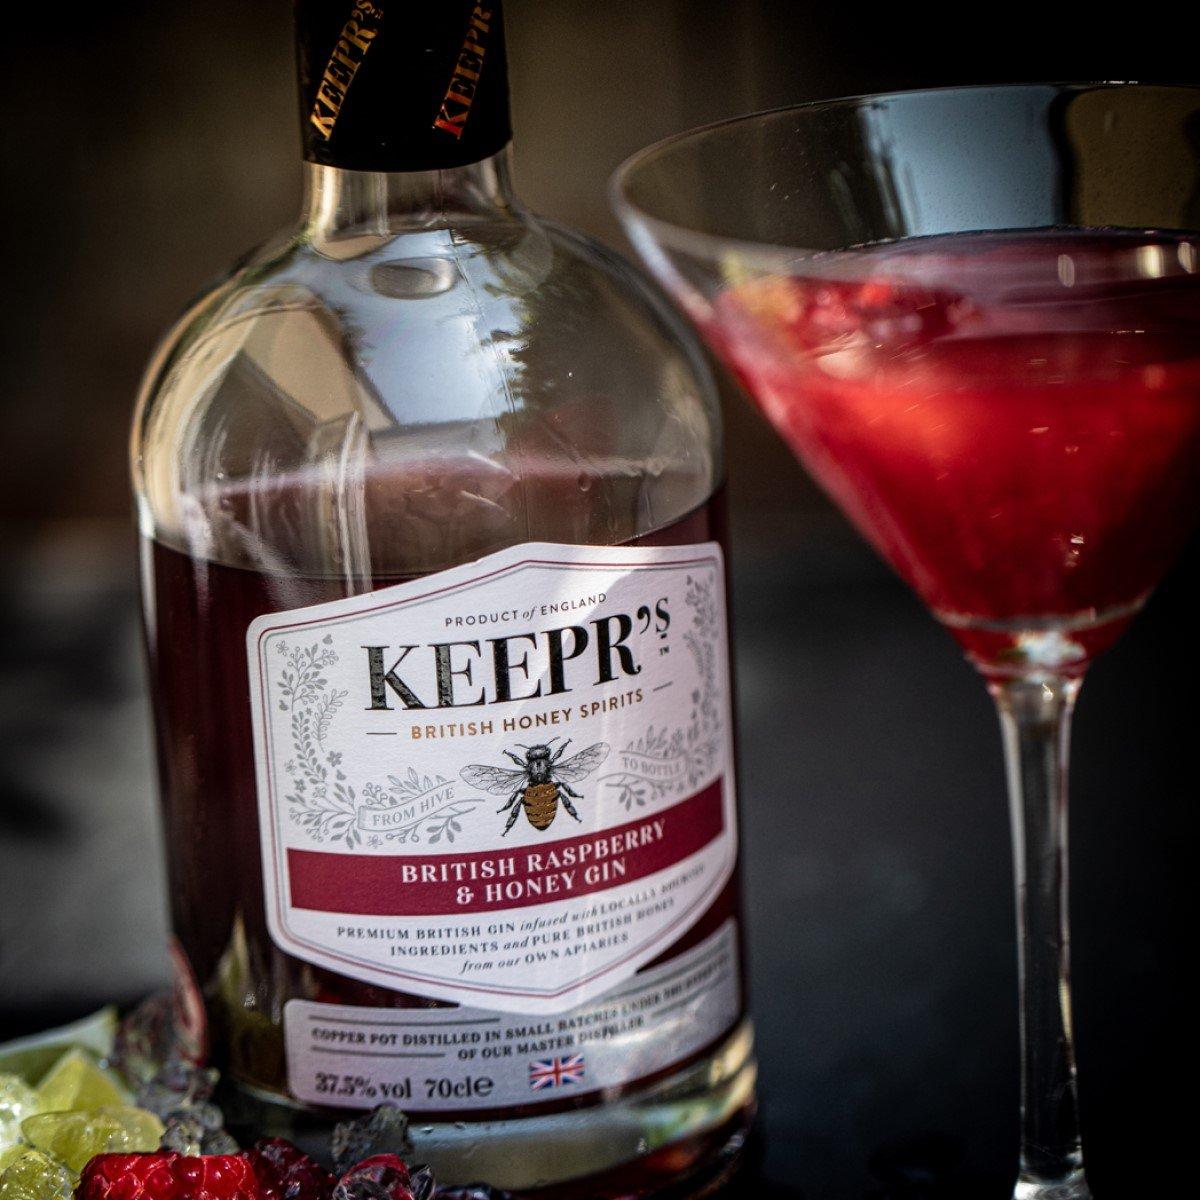 Keeprs British Raspberry & Honey Gin